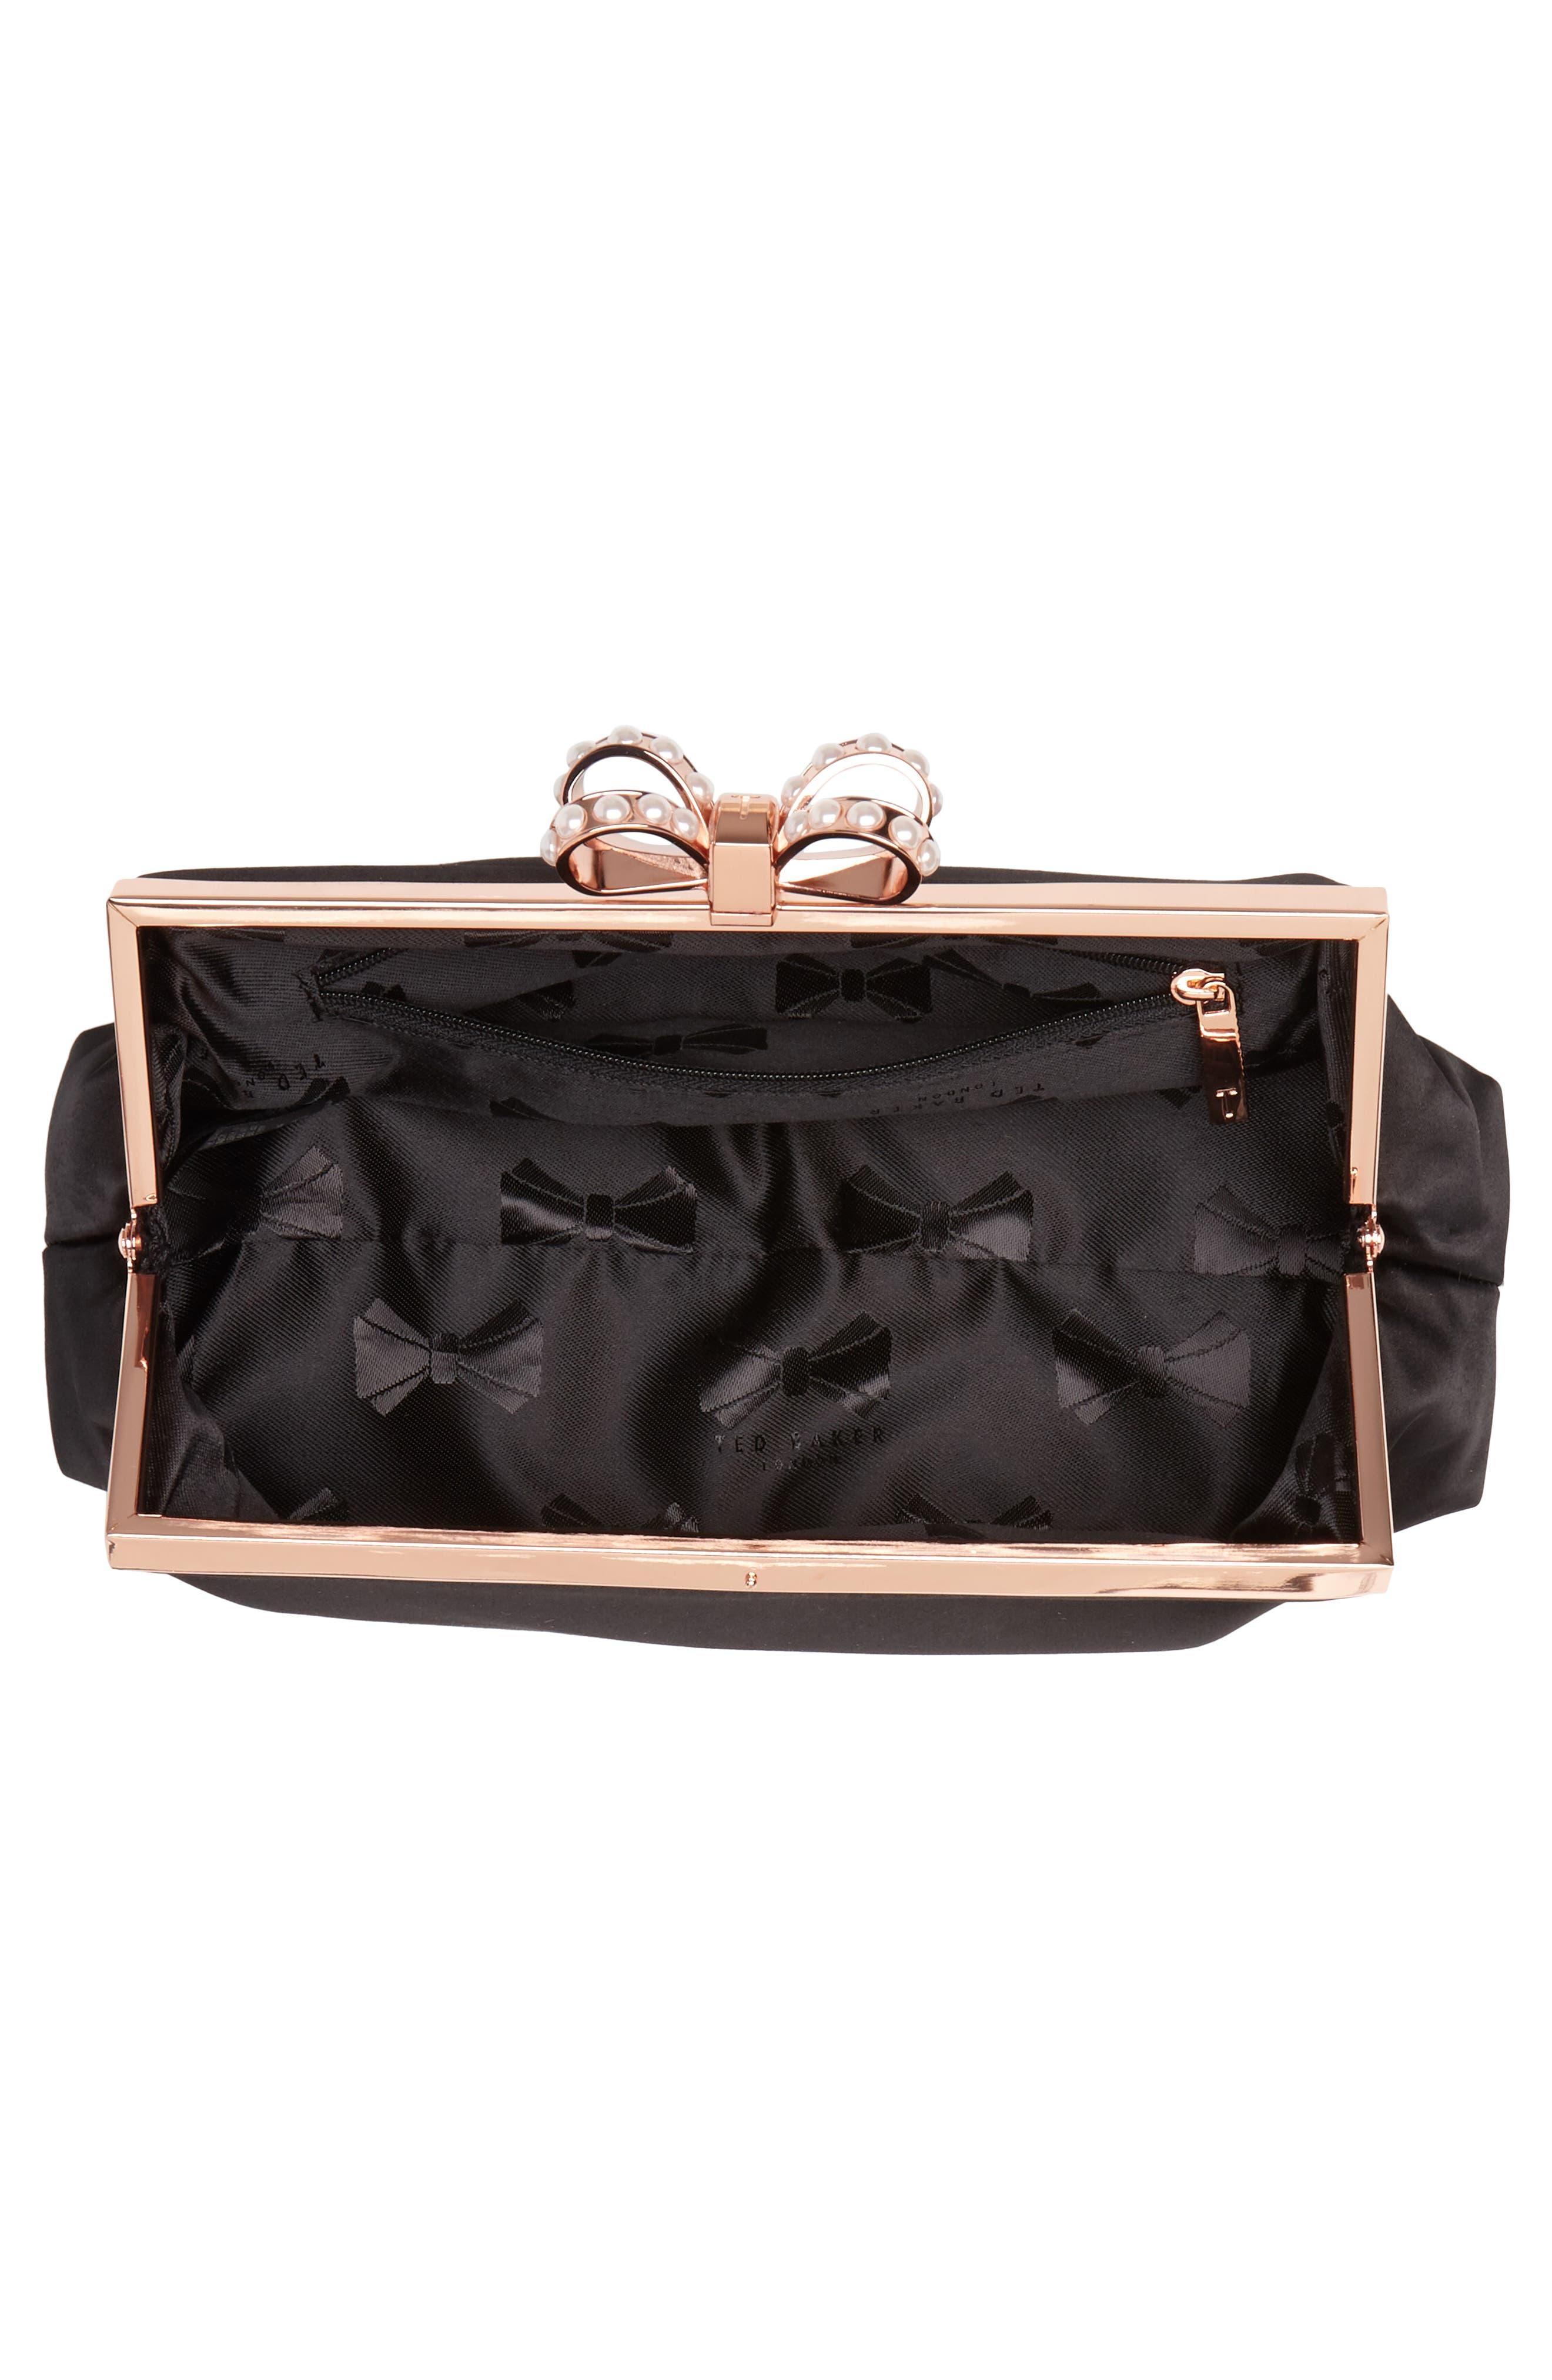 Georgaa Bow Clasp Evening Bag,                             Alternate thumbnail 4, color,                             Black